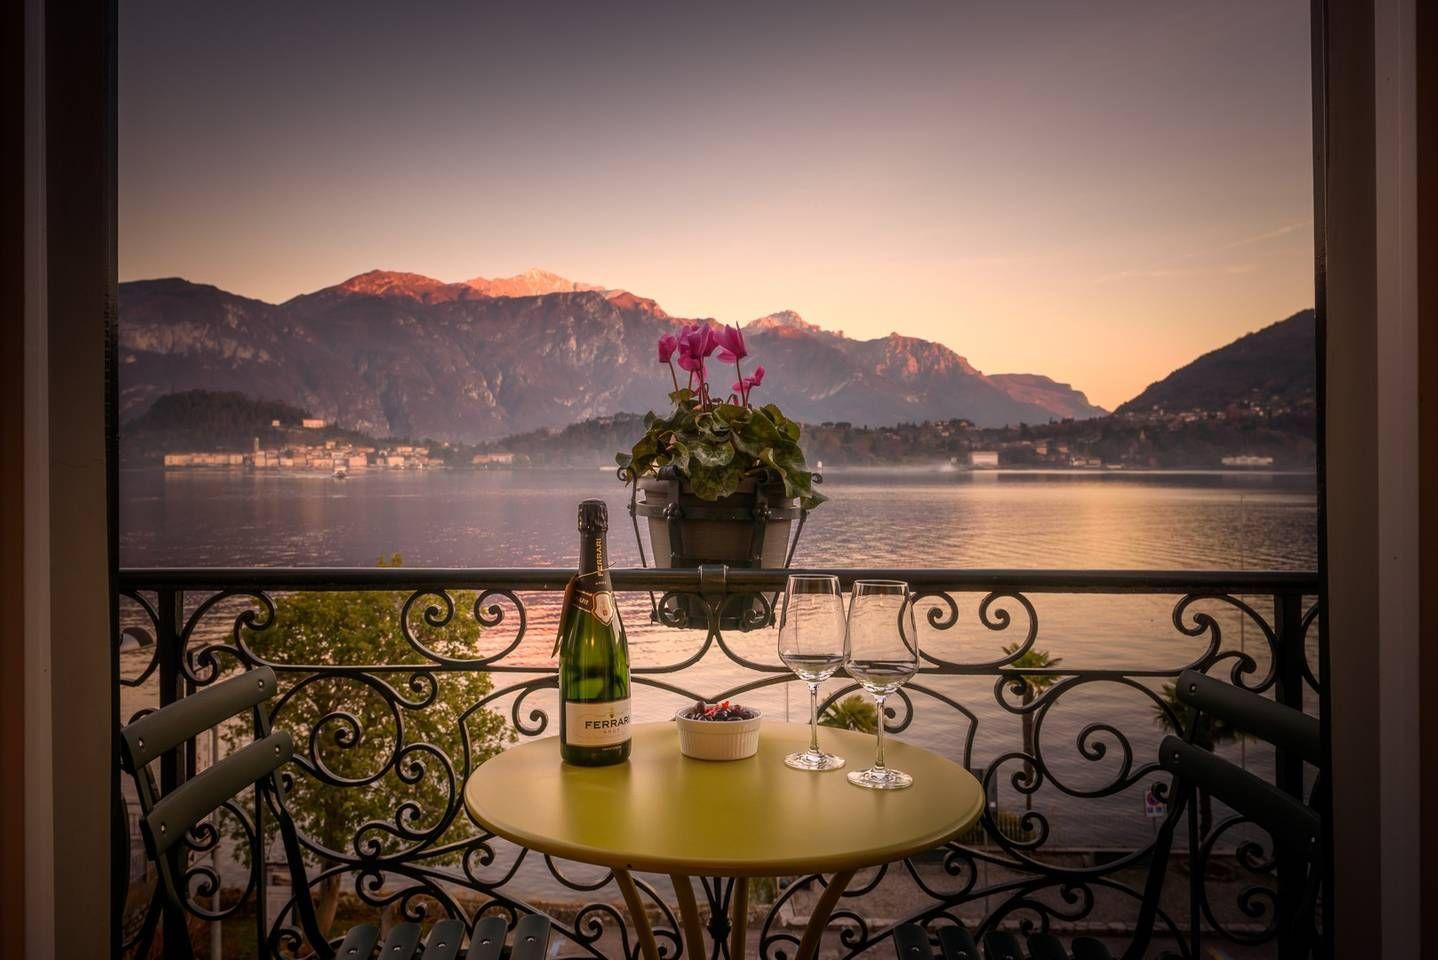 10 dreamy airbnb lake como vacation rentals july 2020